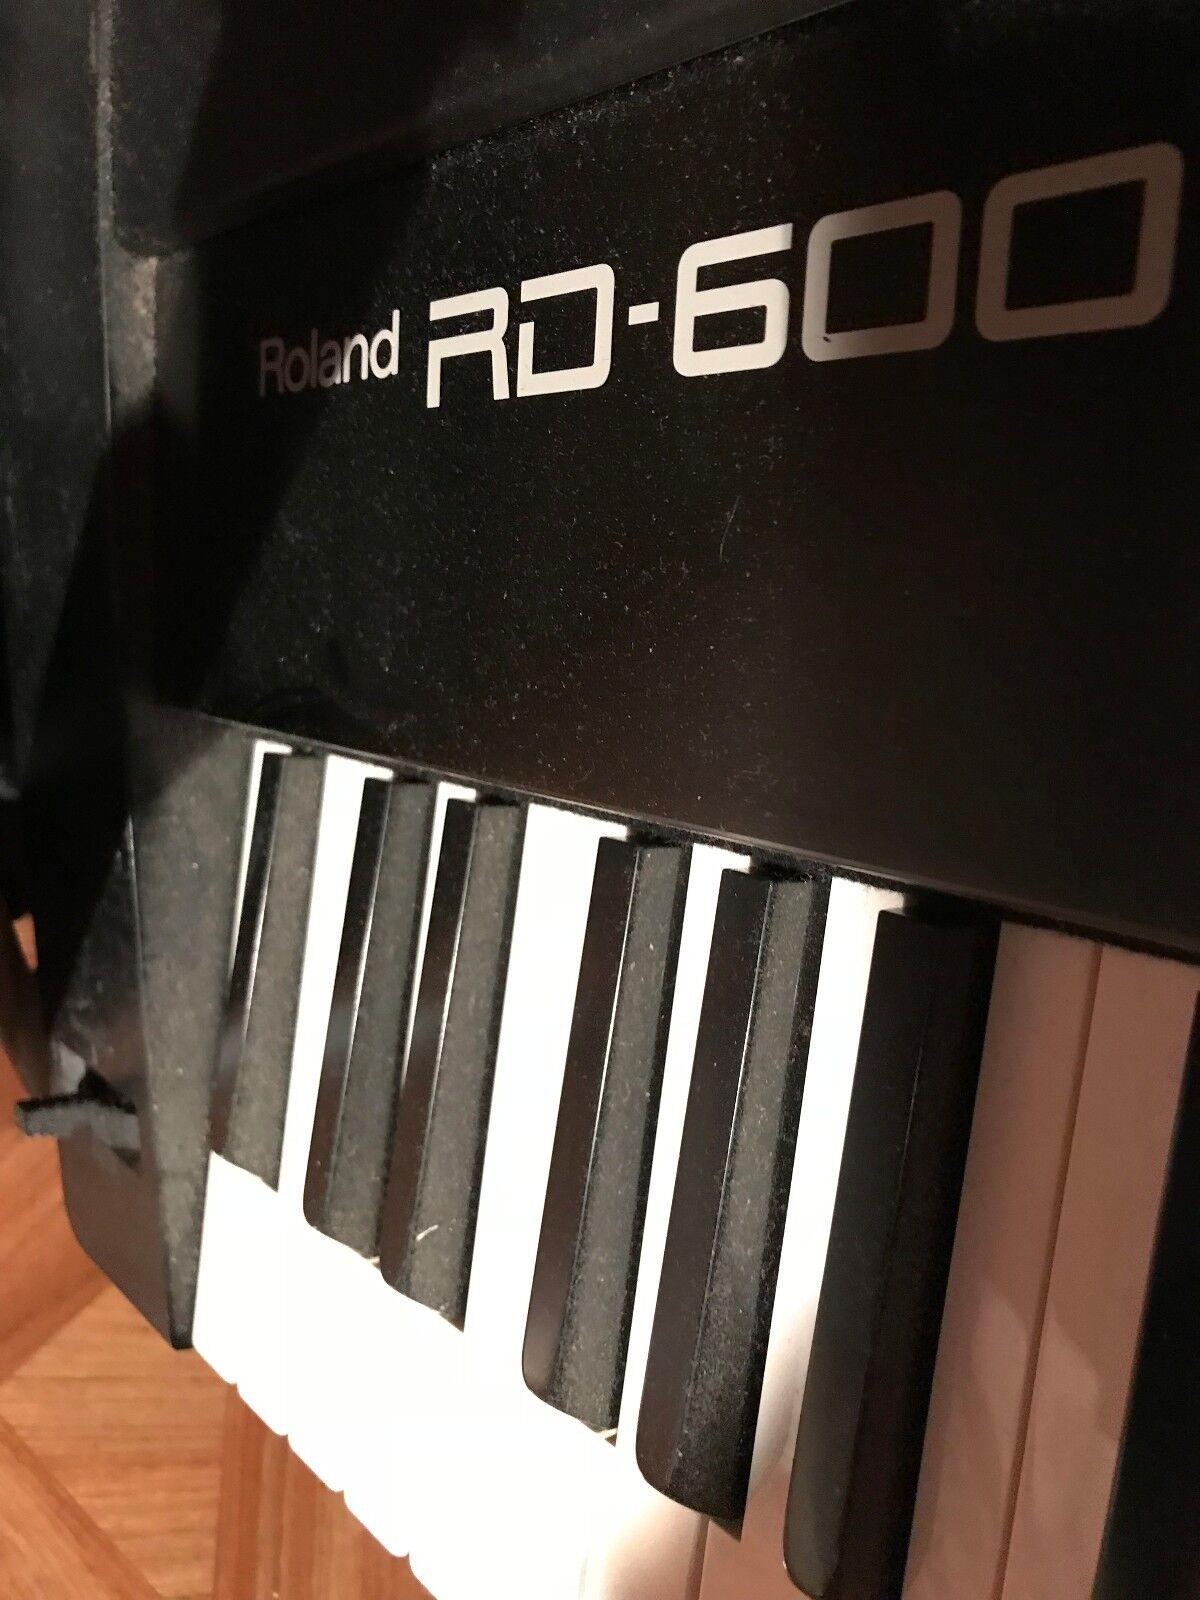 NEW! ROLAND RD-600 DIGITAL STAGE PIANO 88-key professional o